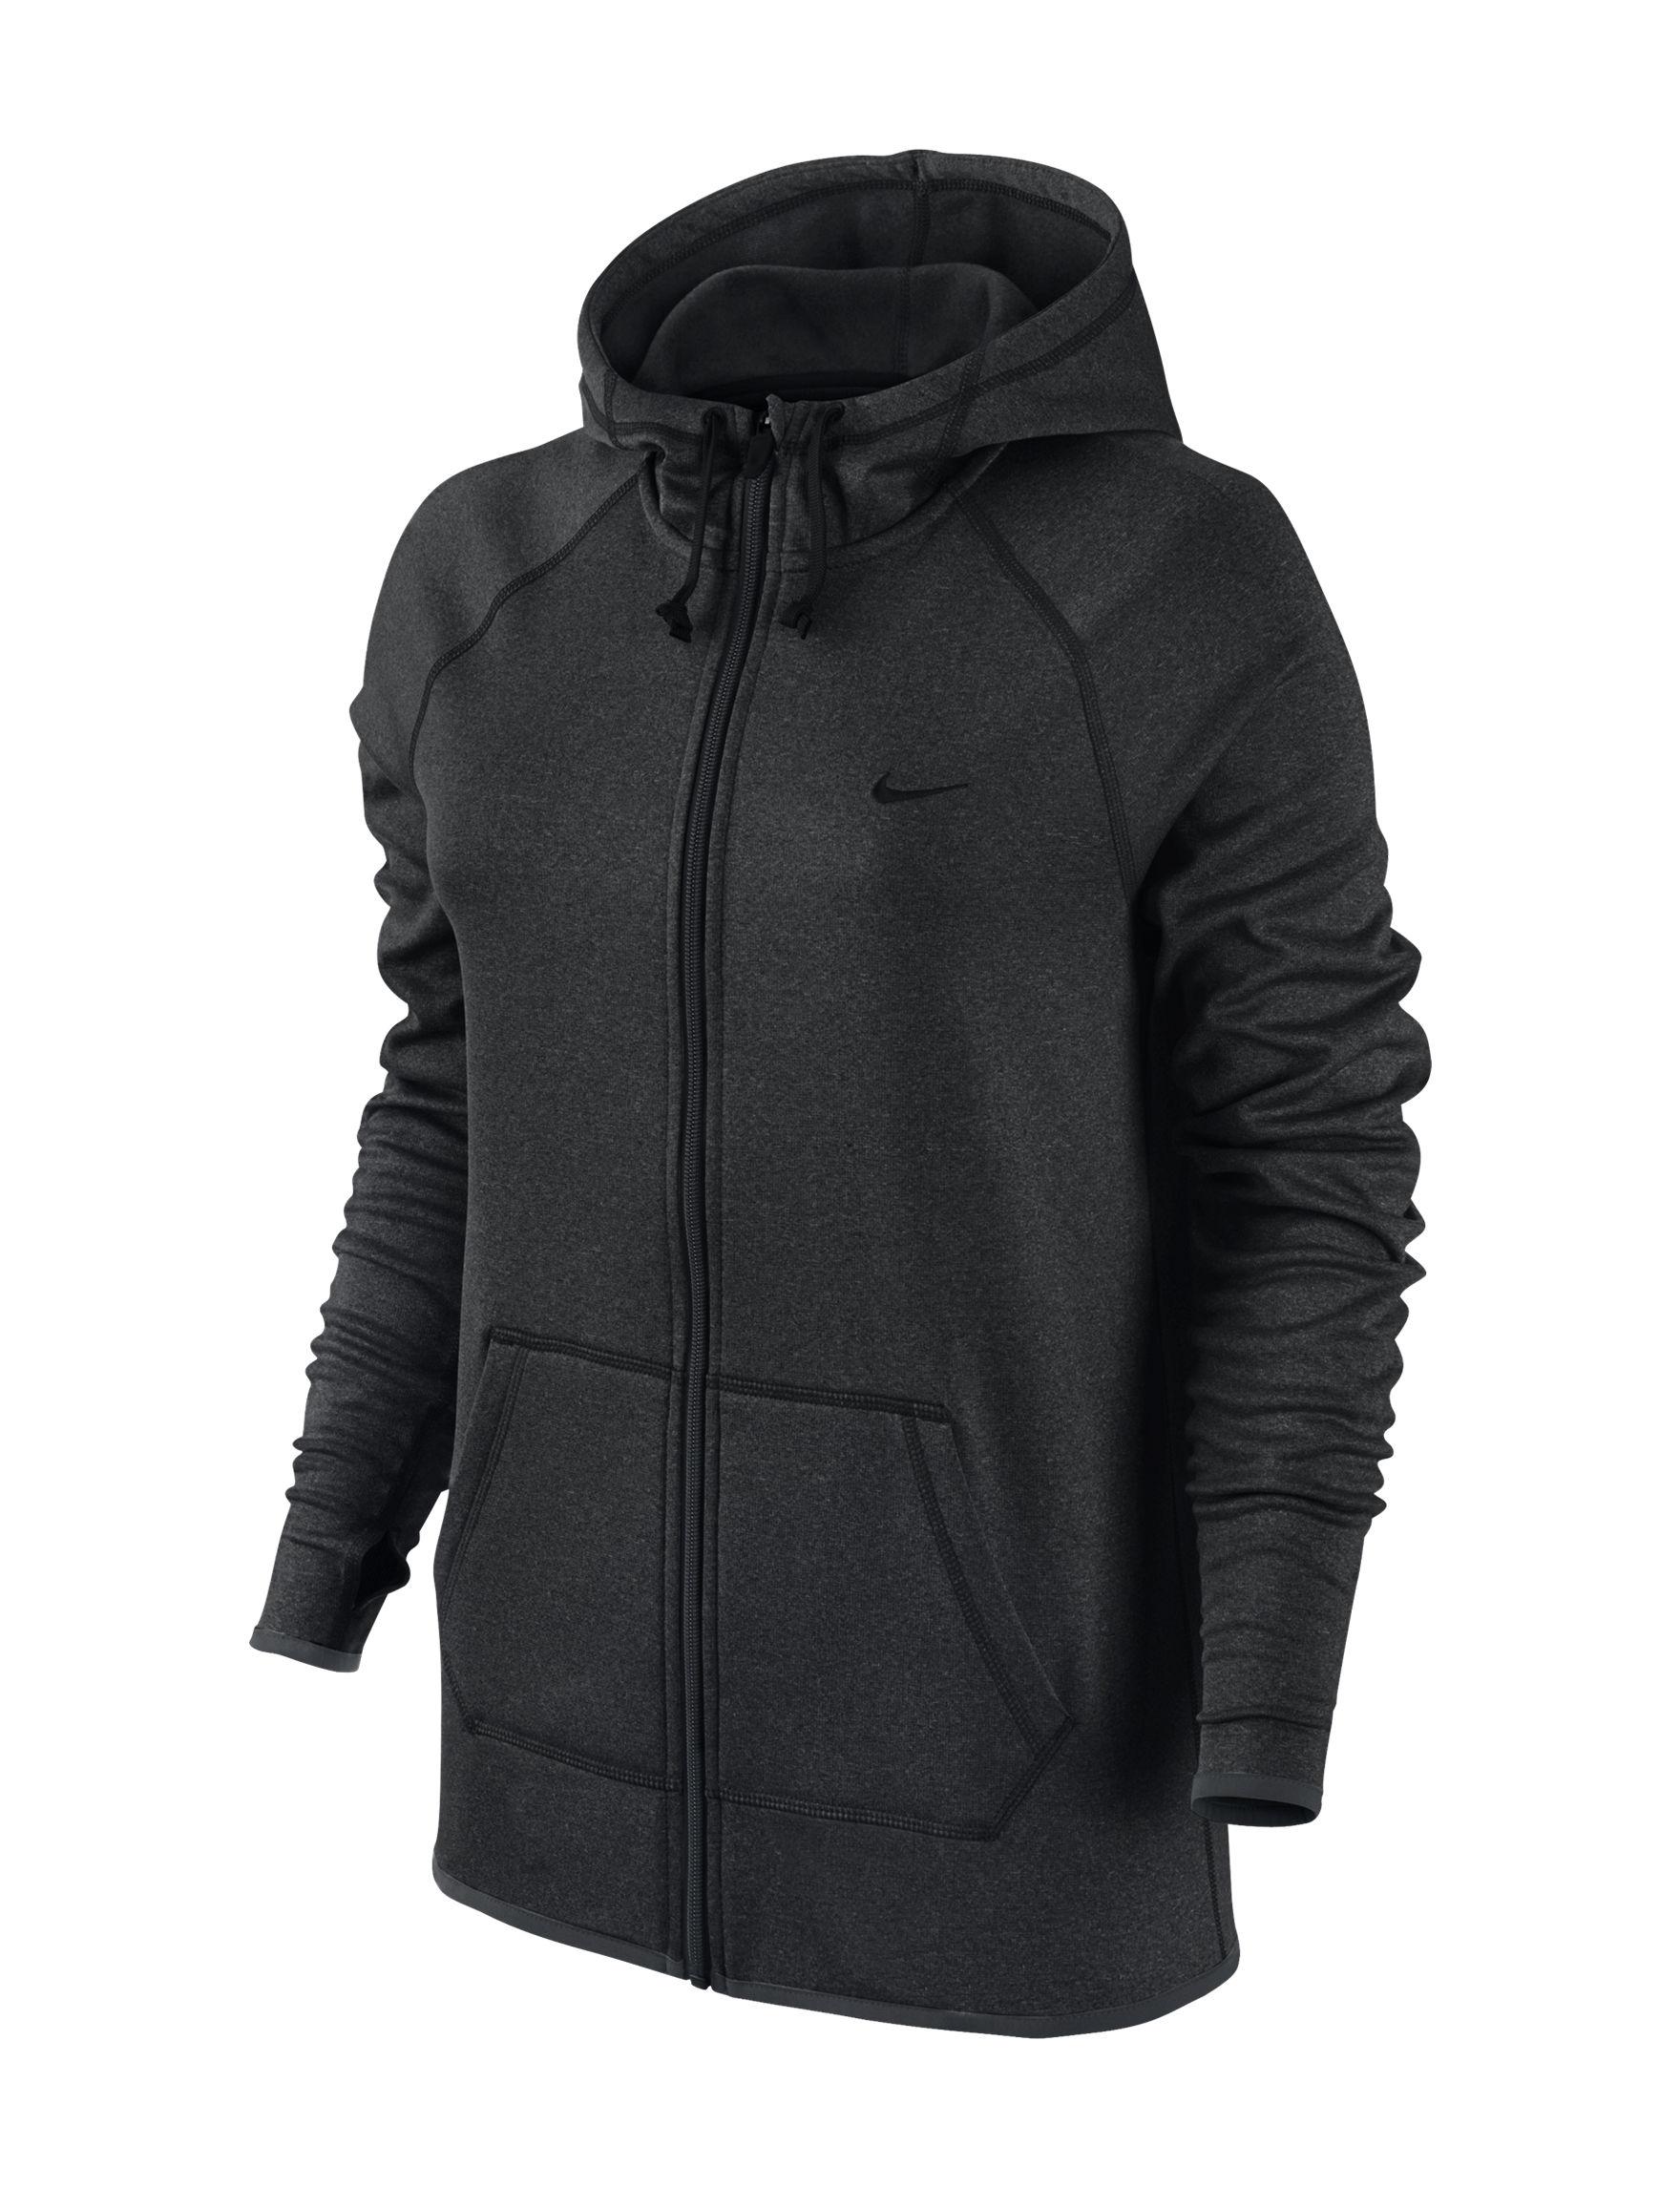 Nike Charcoal Lightweight Jackets & Blazers